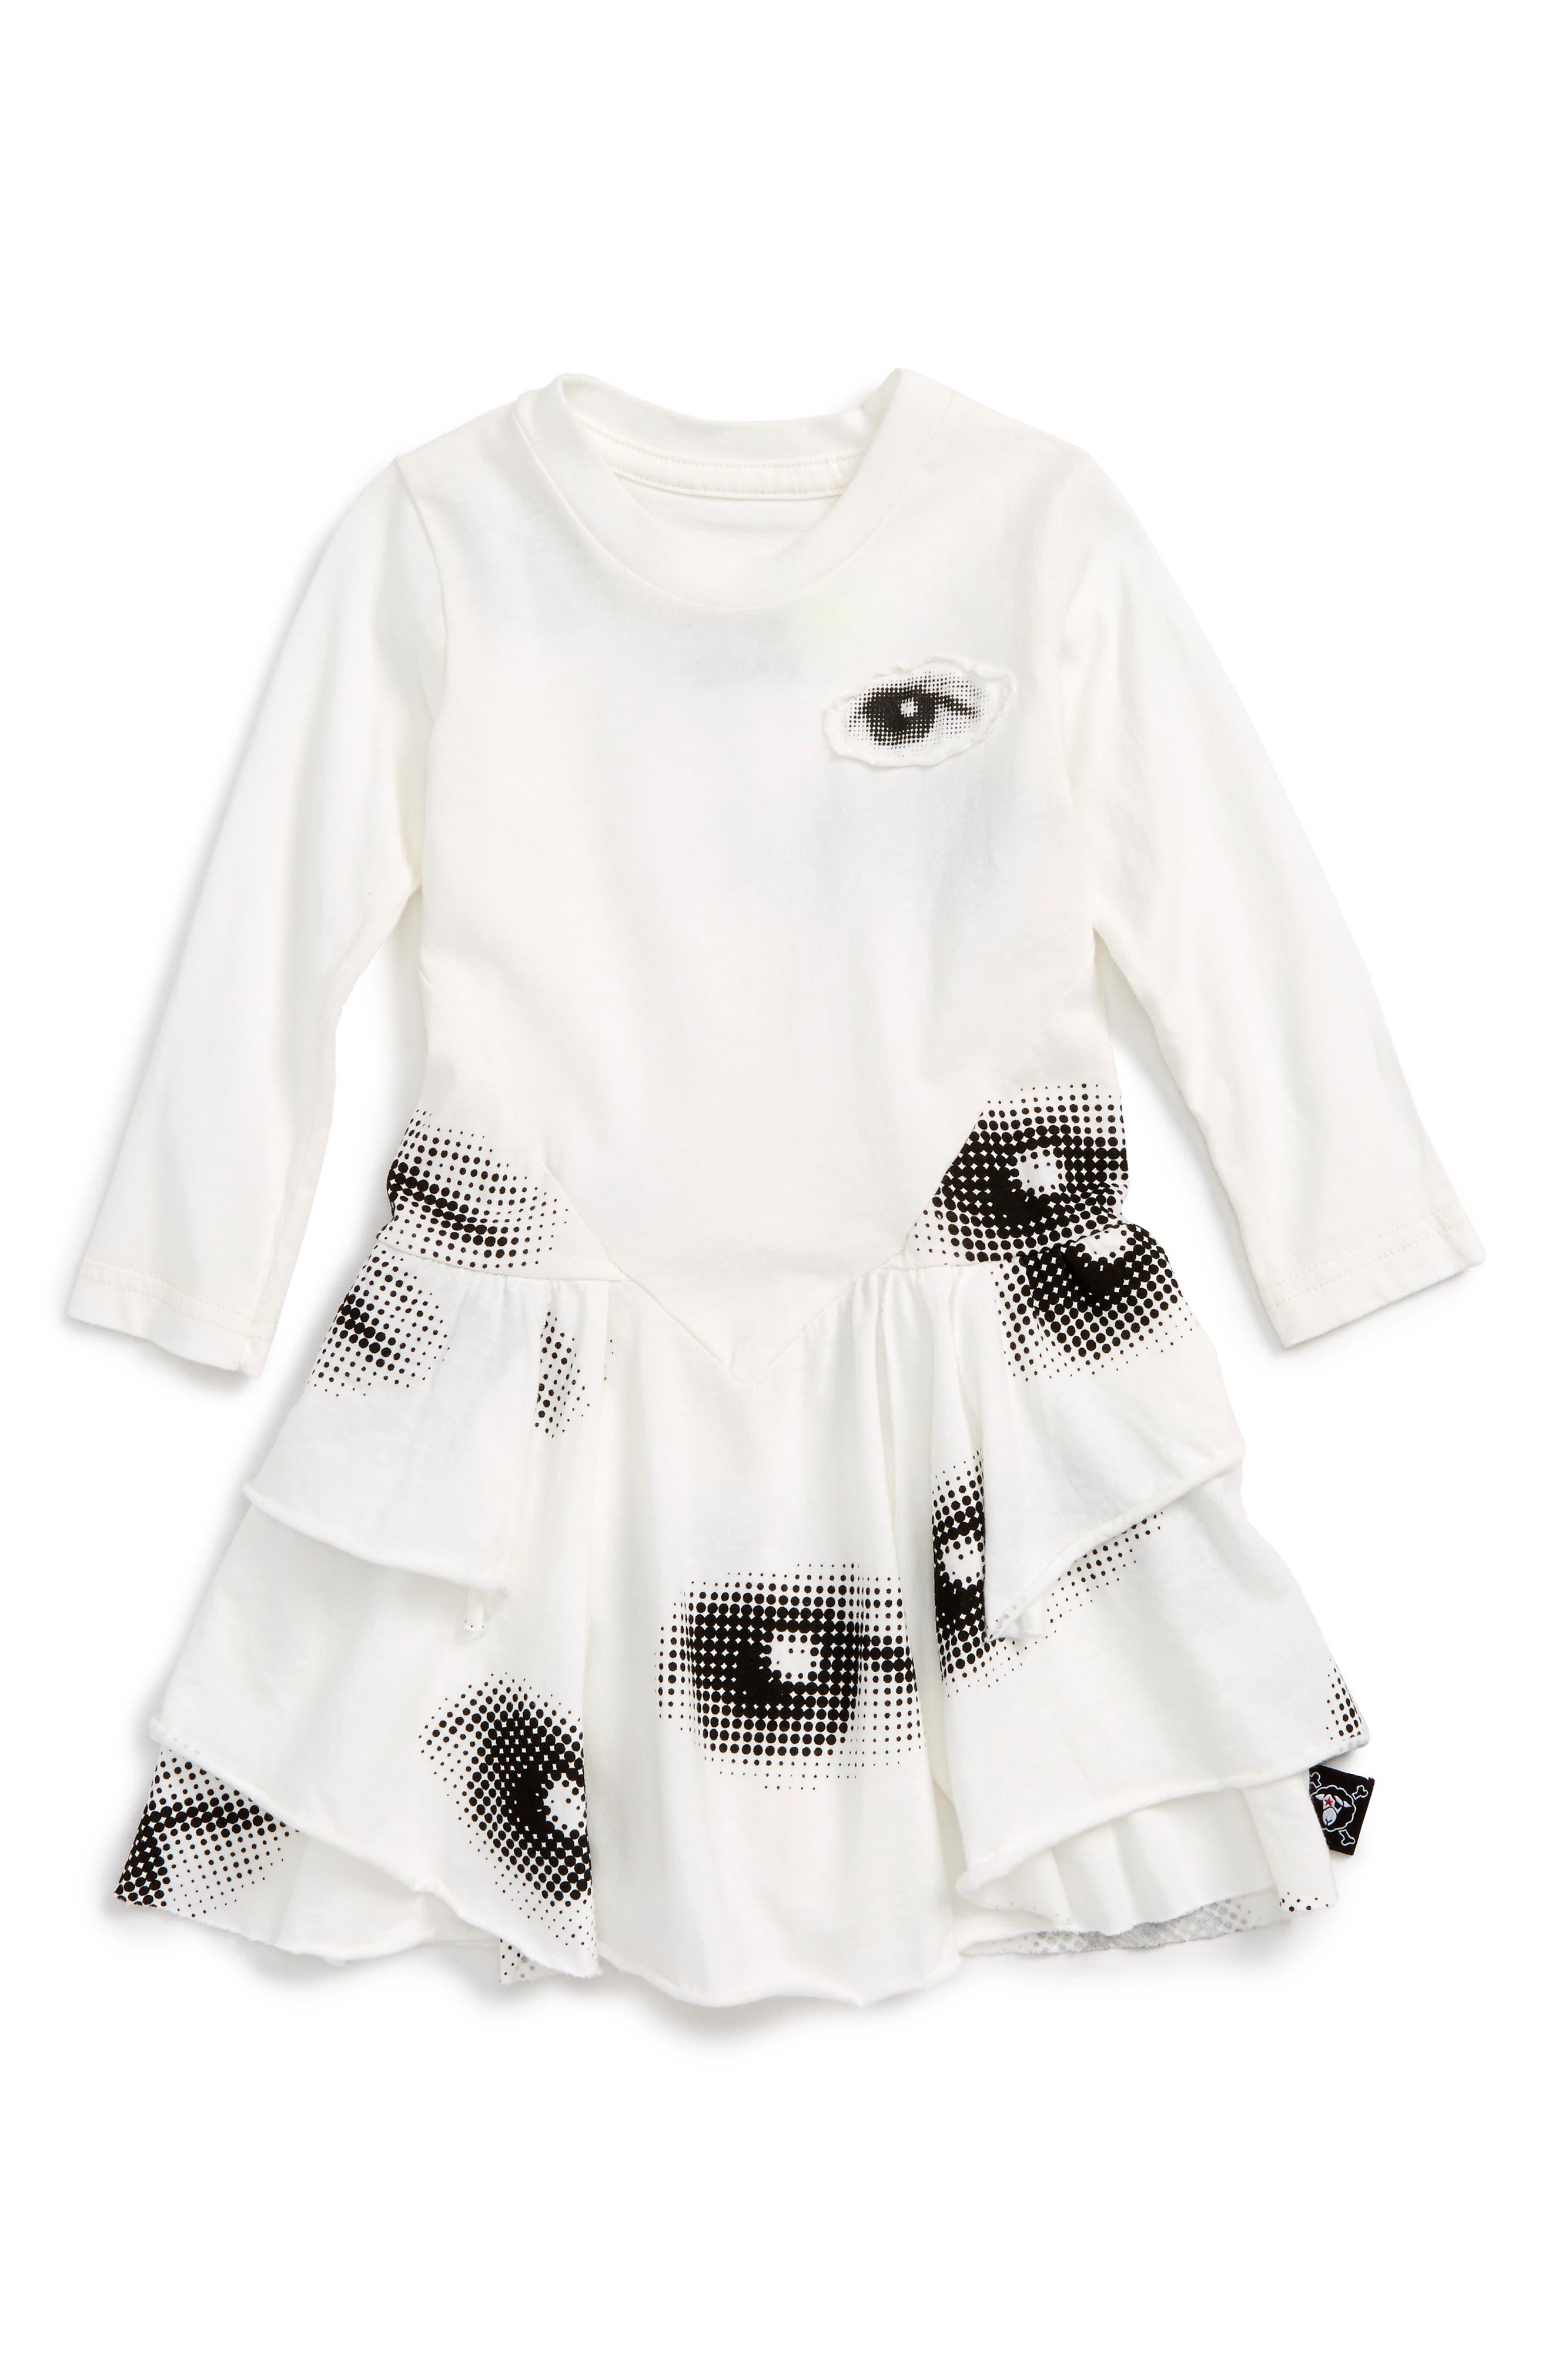 Main Image - NUNUNU Layered Eye Dress (Baby Girls)